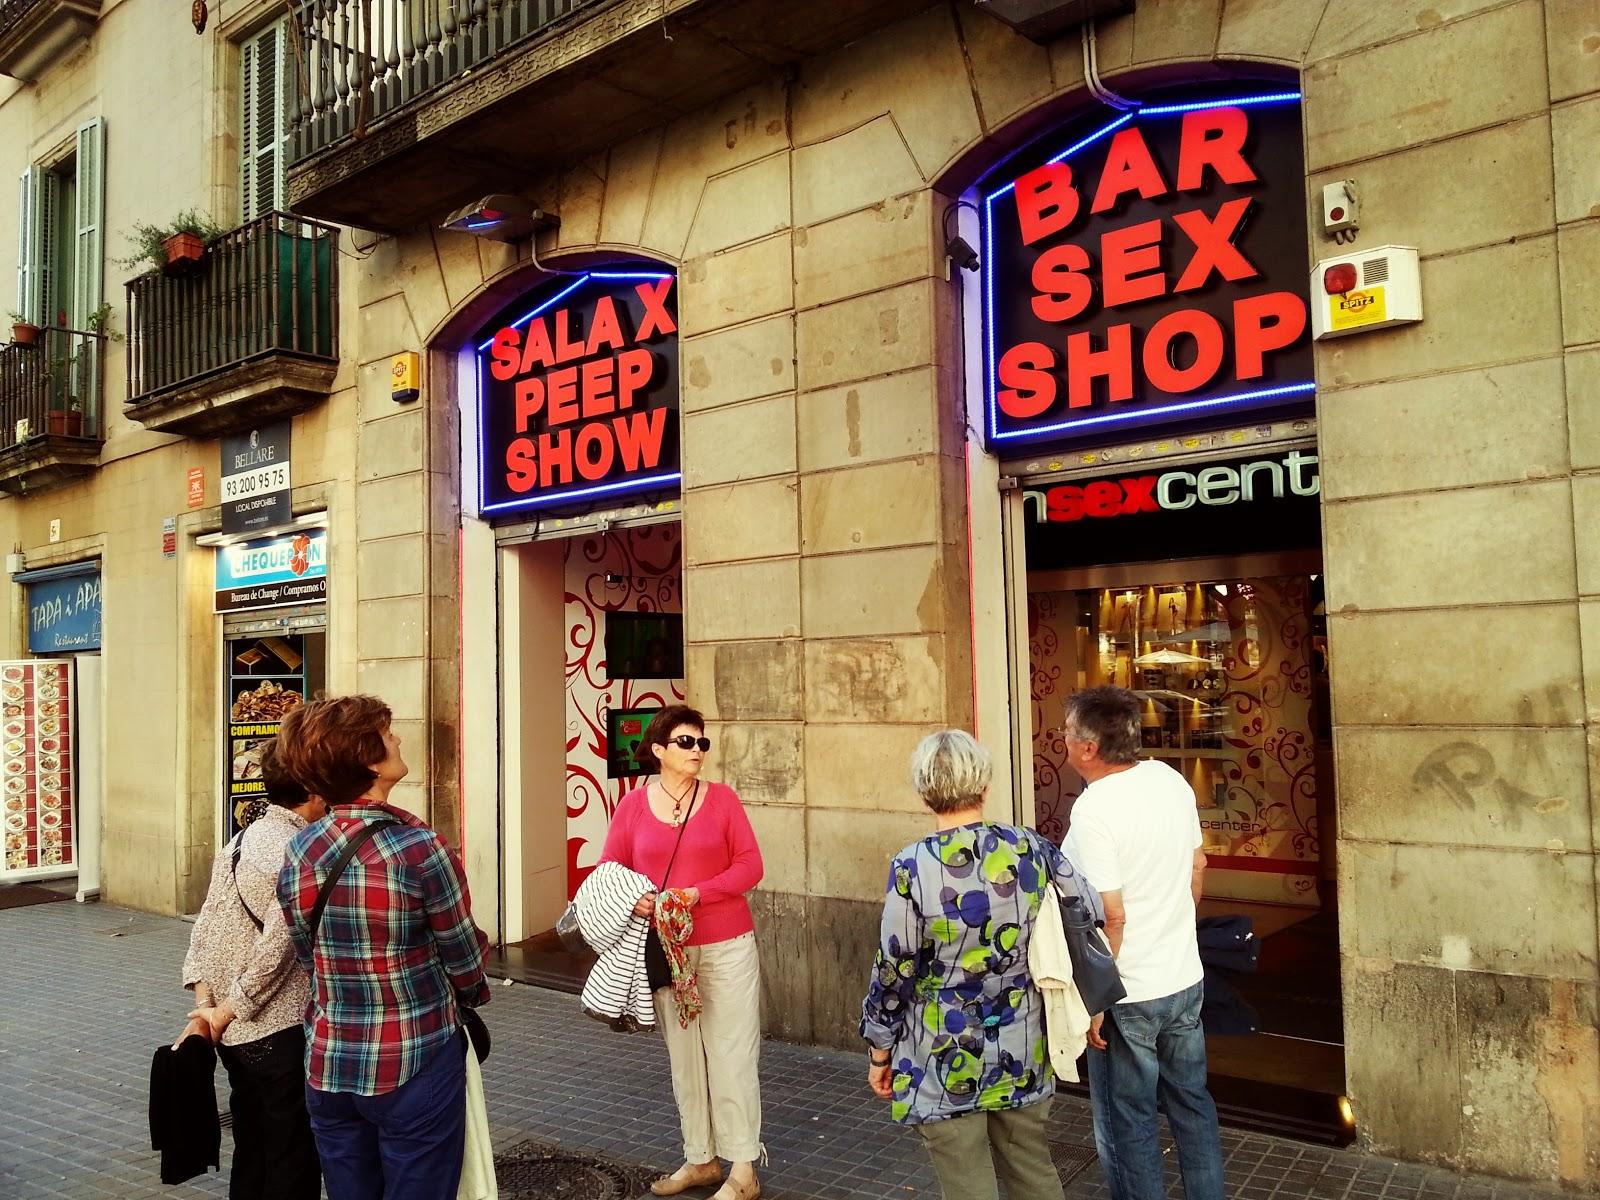 sex shop lyon